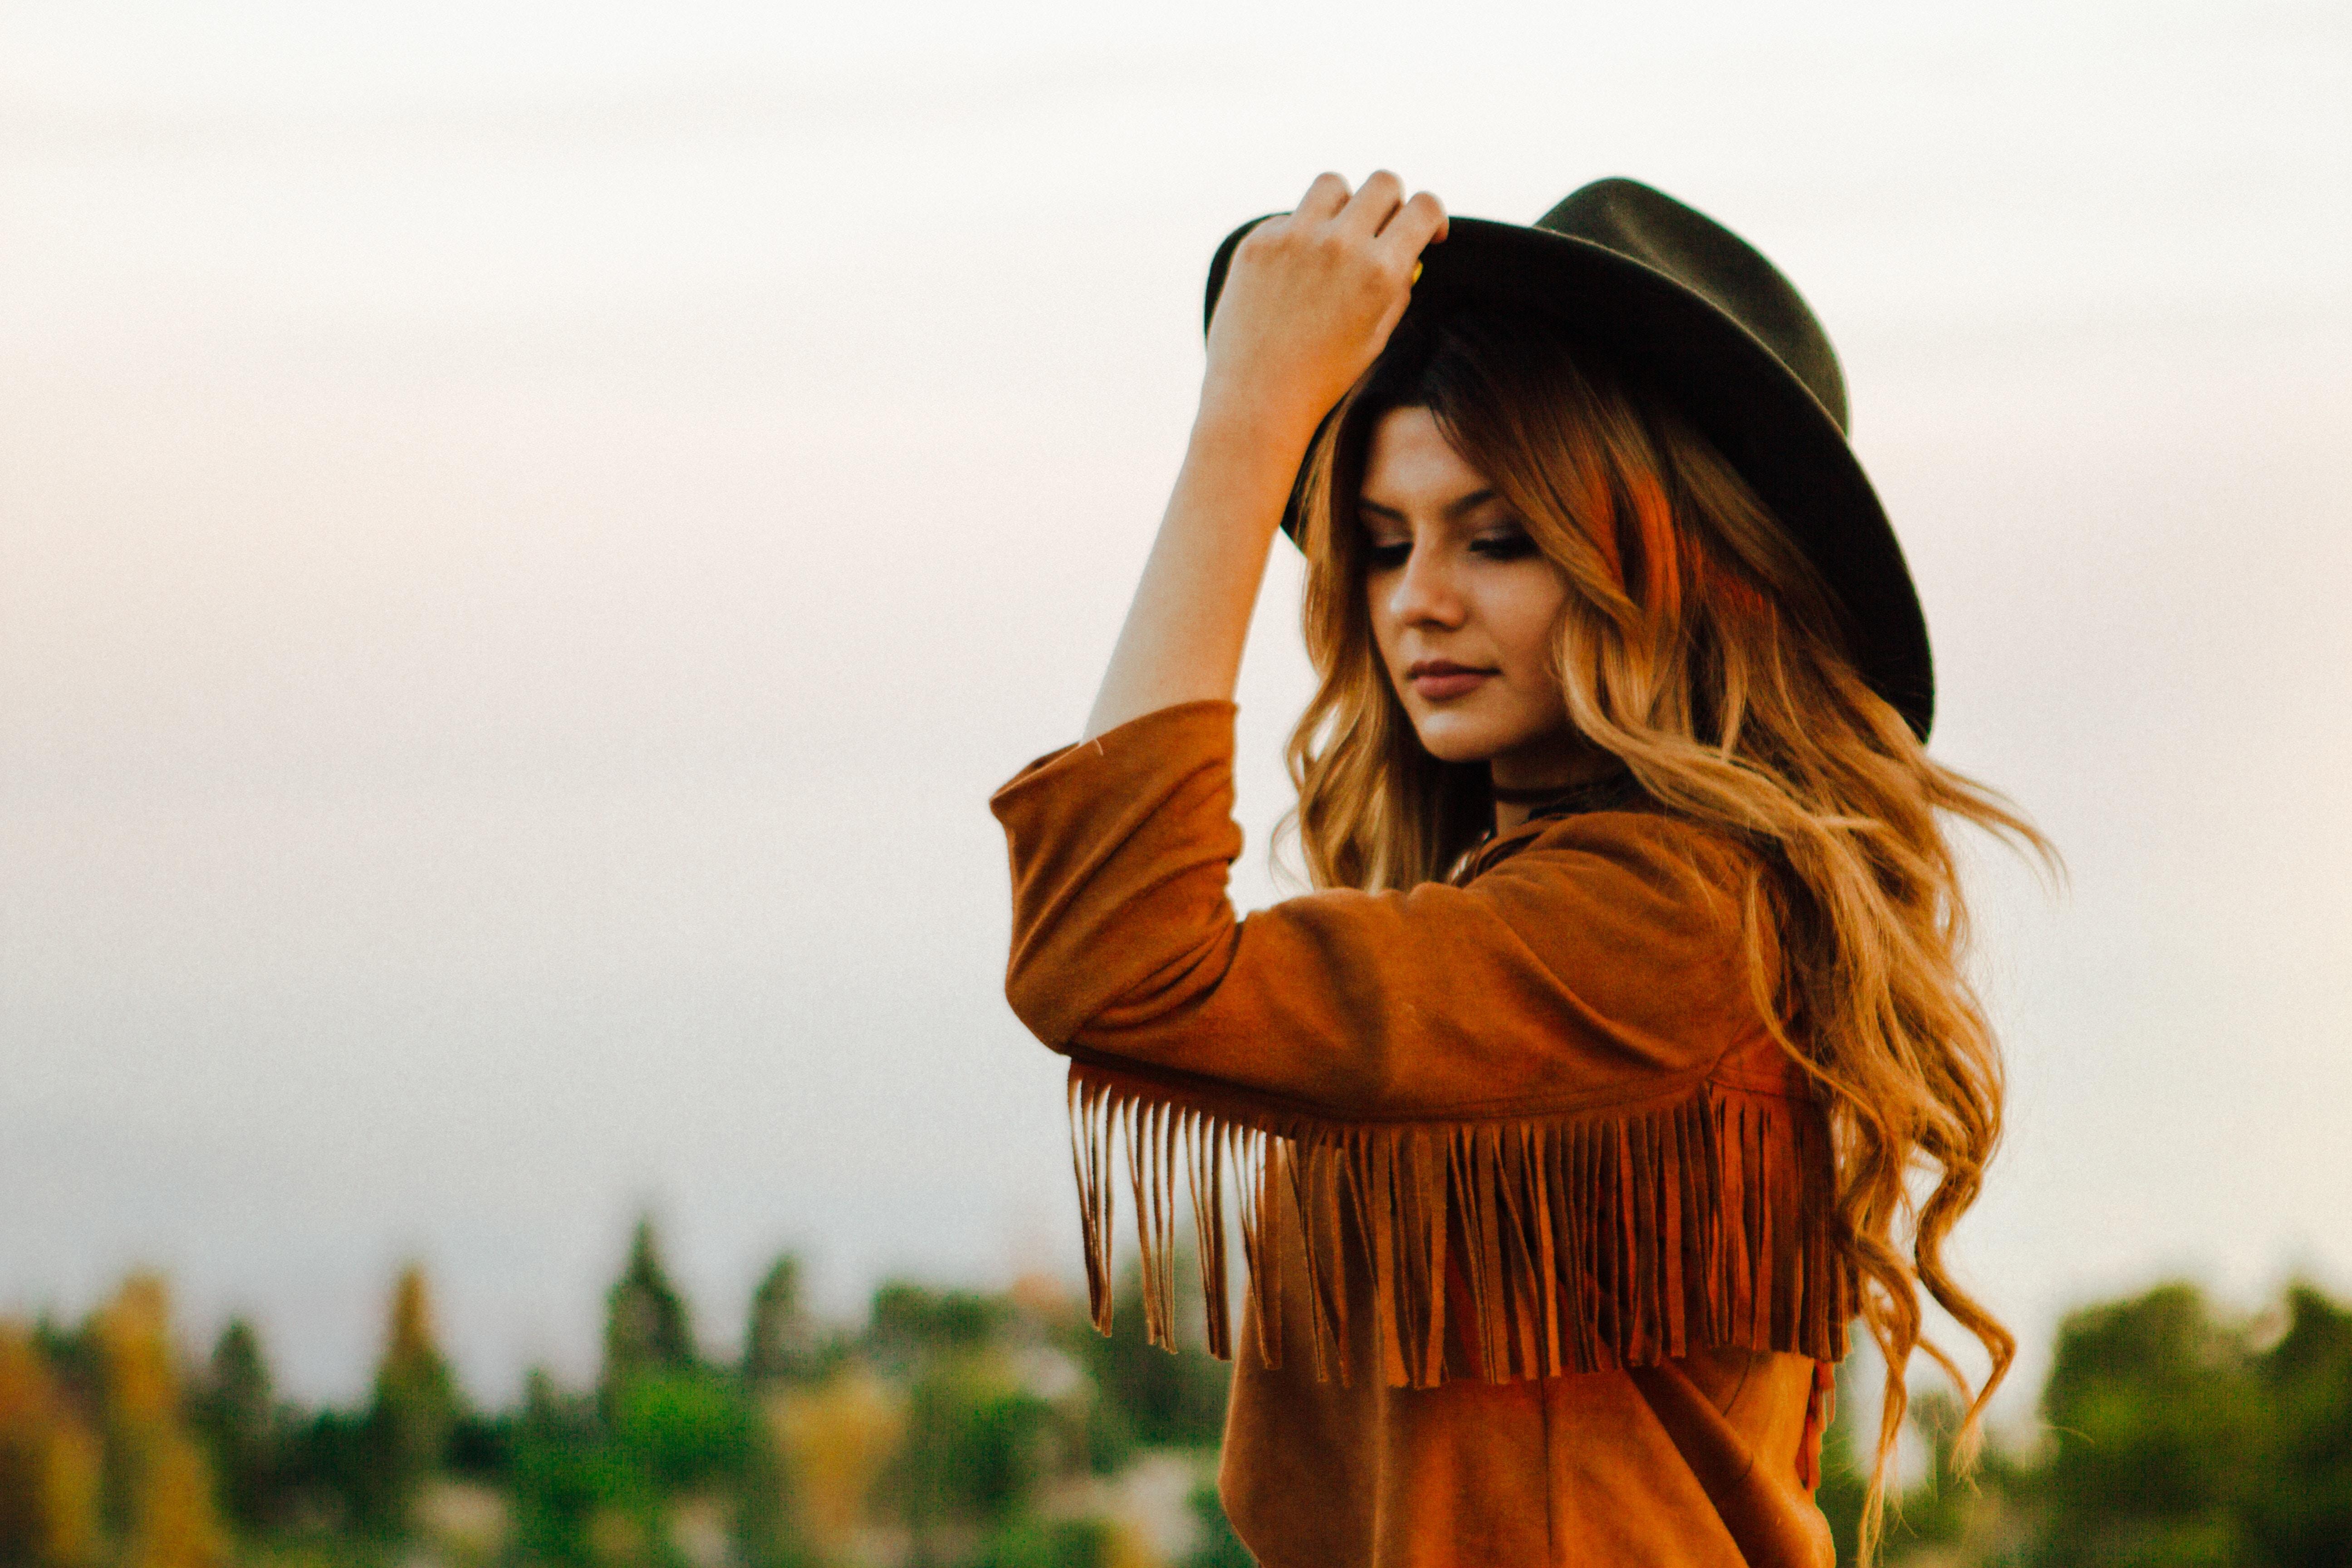 fringe cowgirl